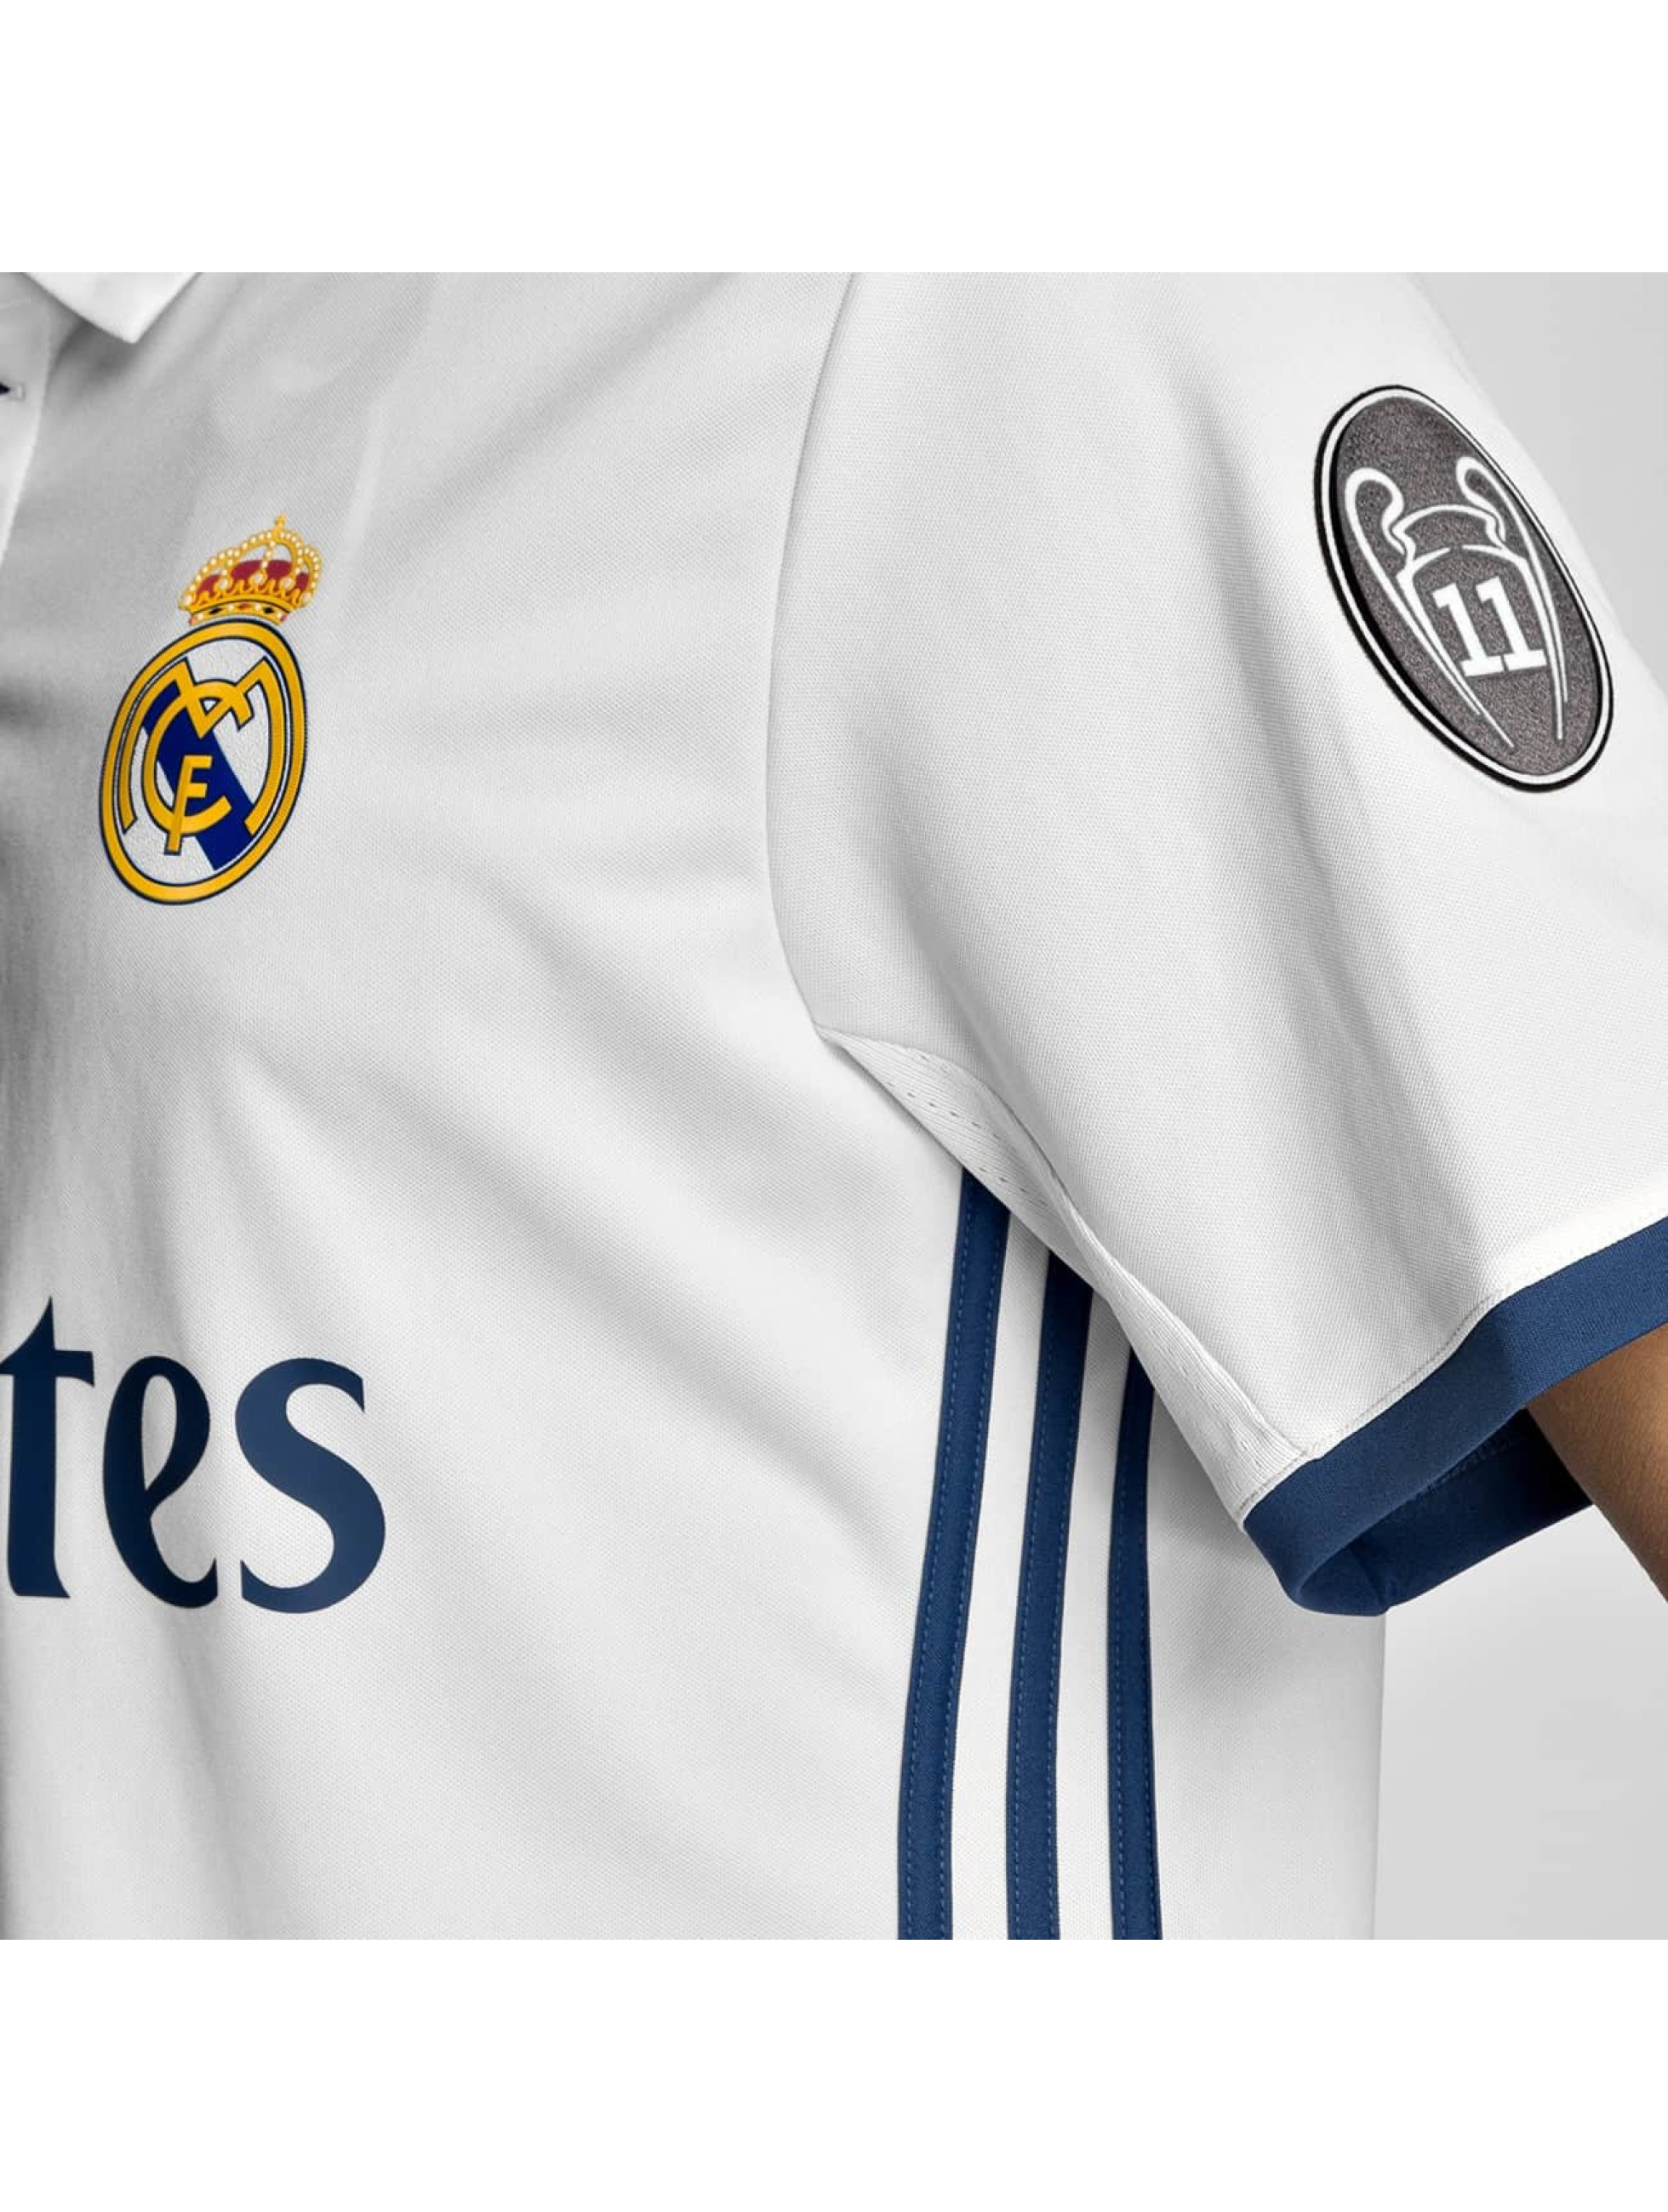 adidas originals T-Shirt Real Madrid white